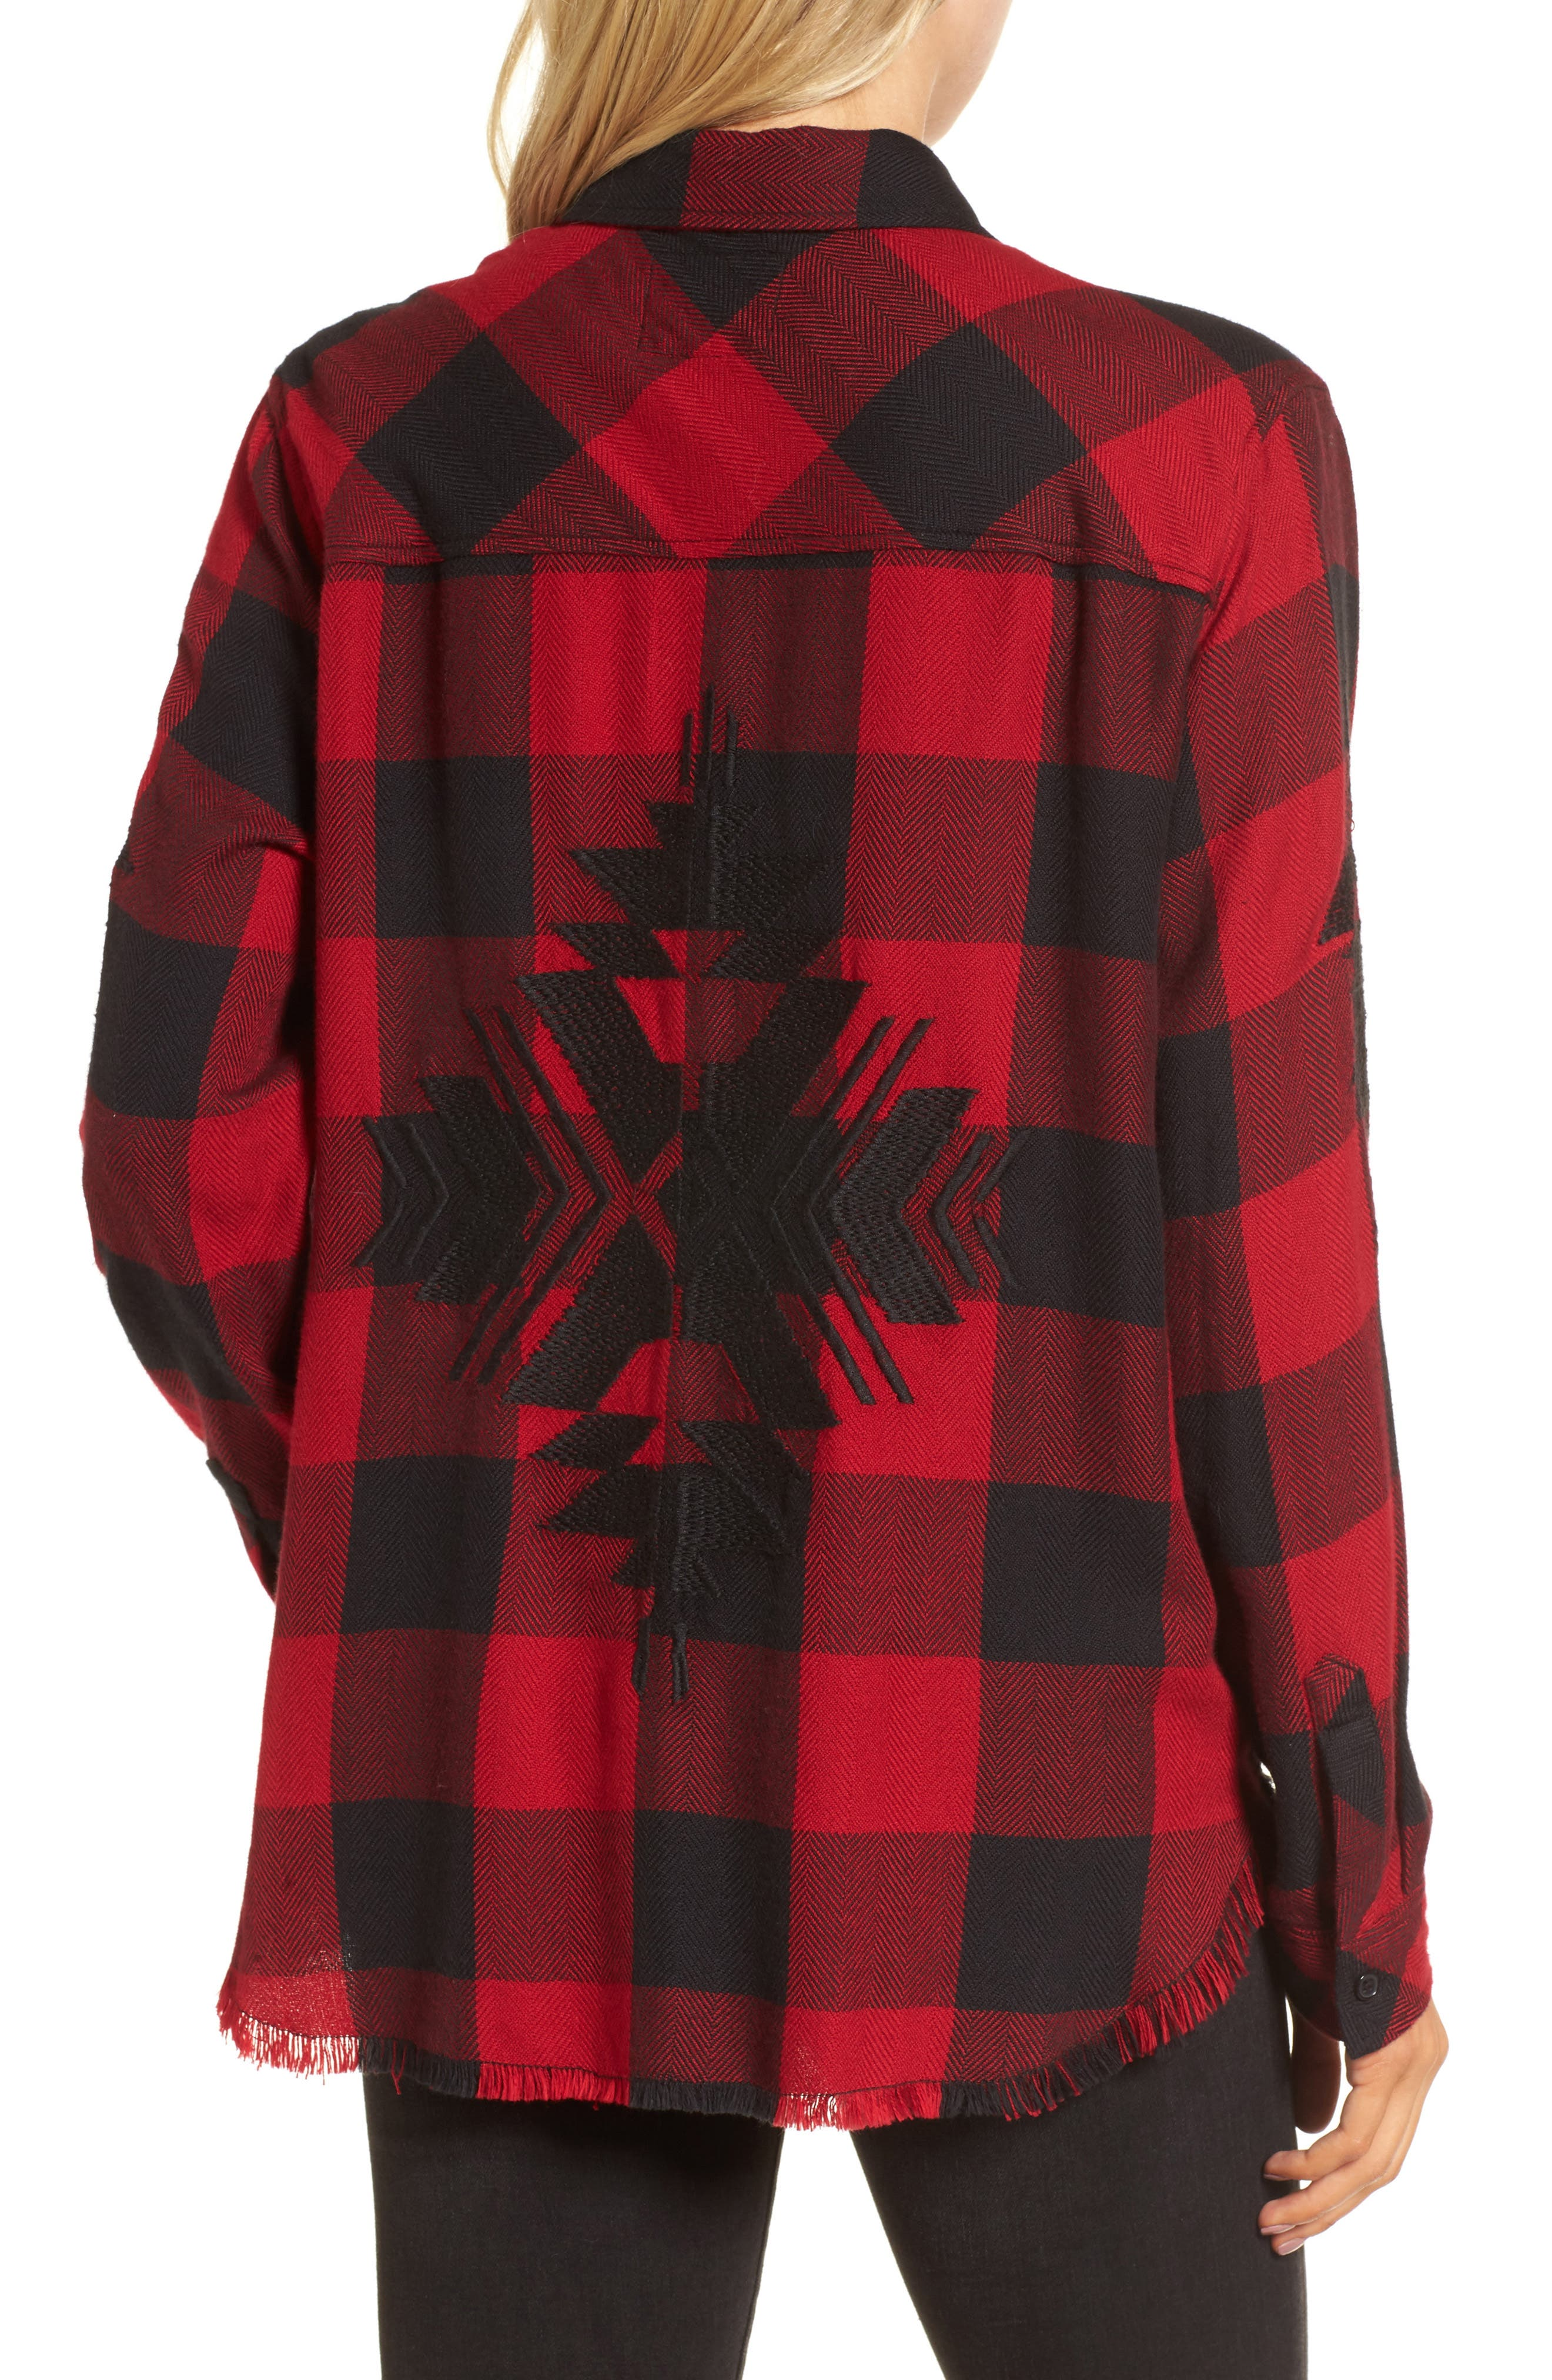 Larsson Embroidered Flannel Shirt,                             Alternate thumbnail 3, color,                             Crimson Jet